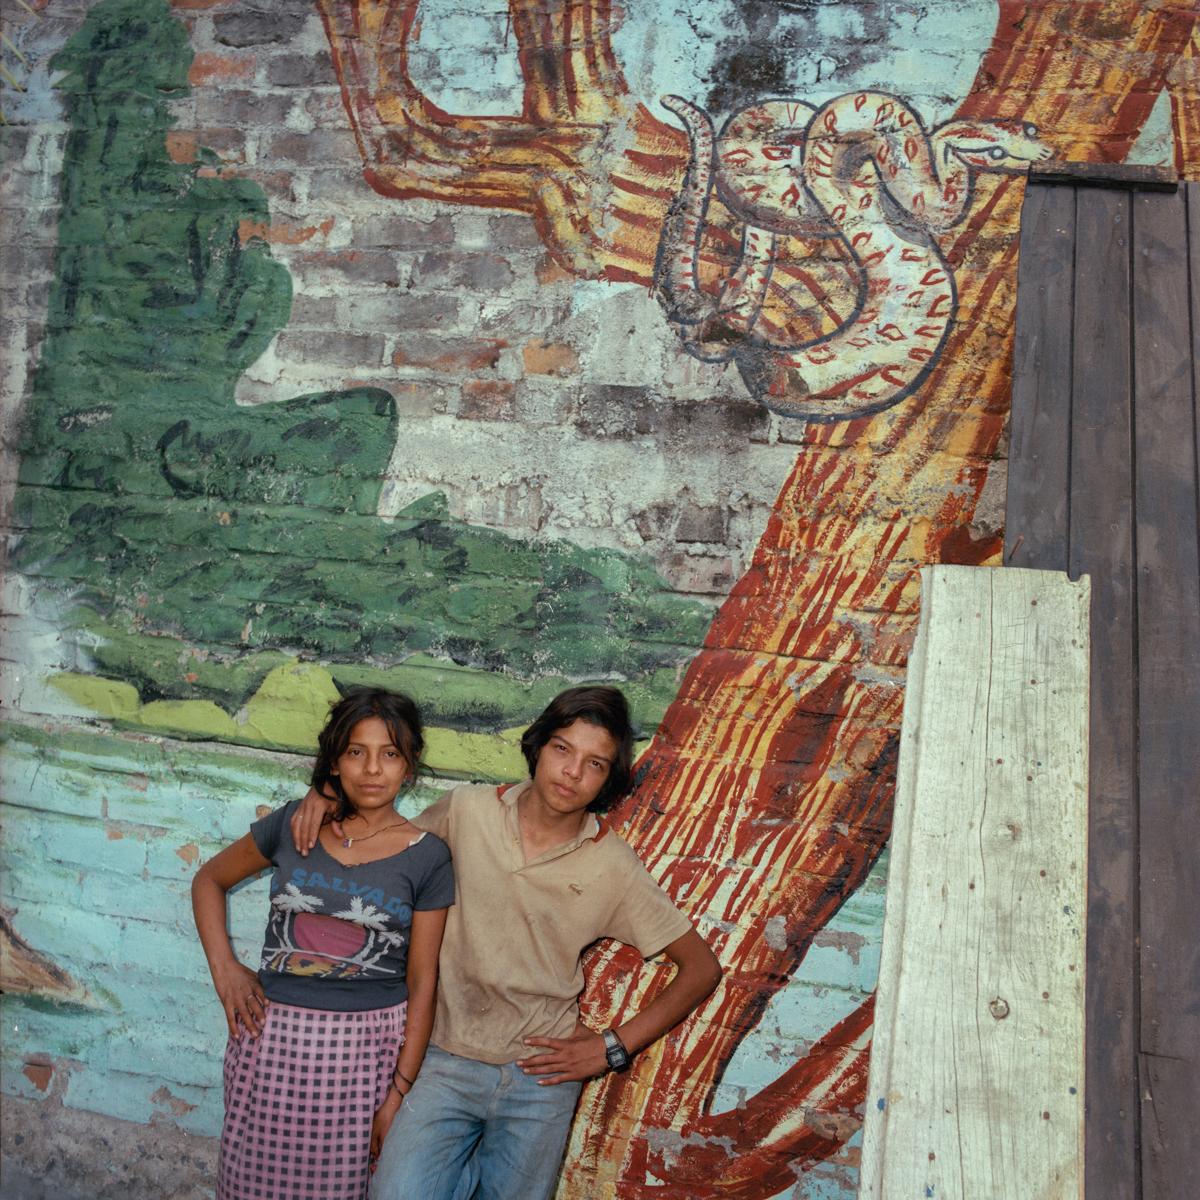 Homeless Couple, El Salvador 1987